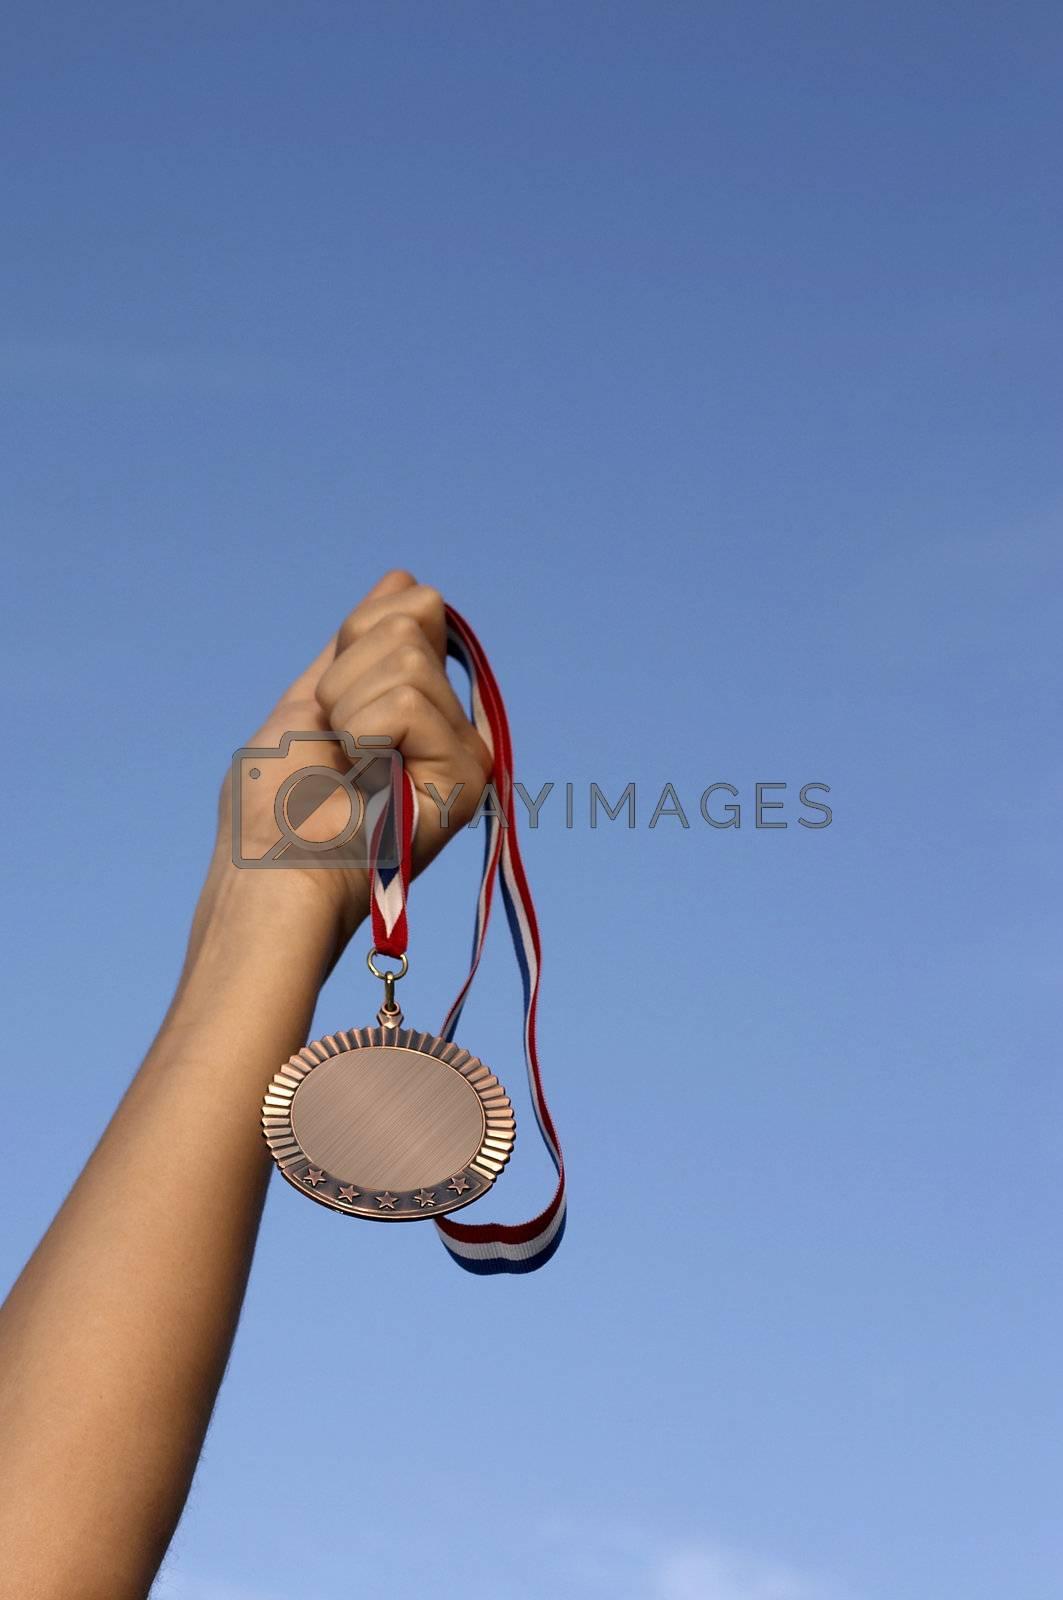 hand holding award in sky